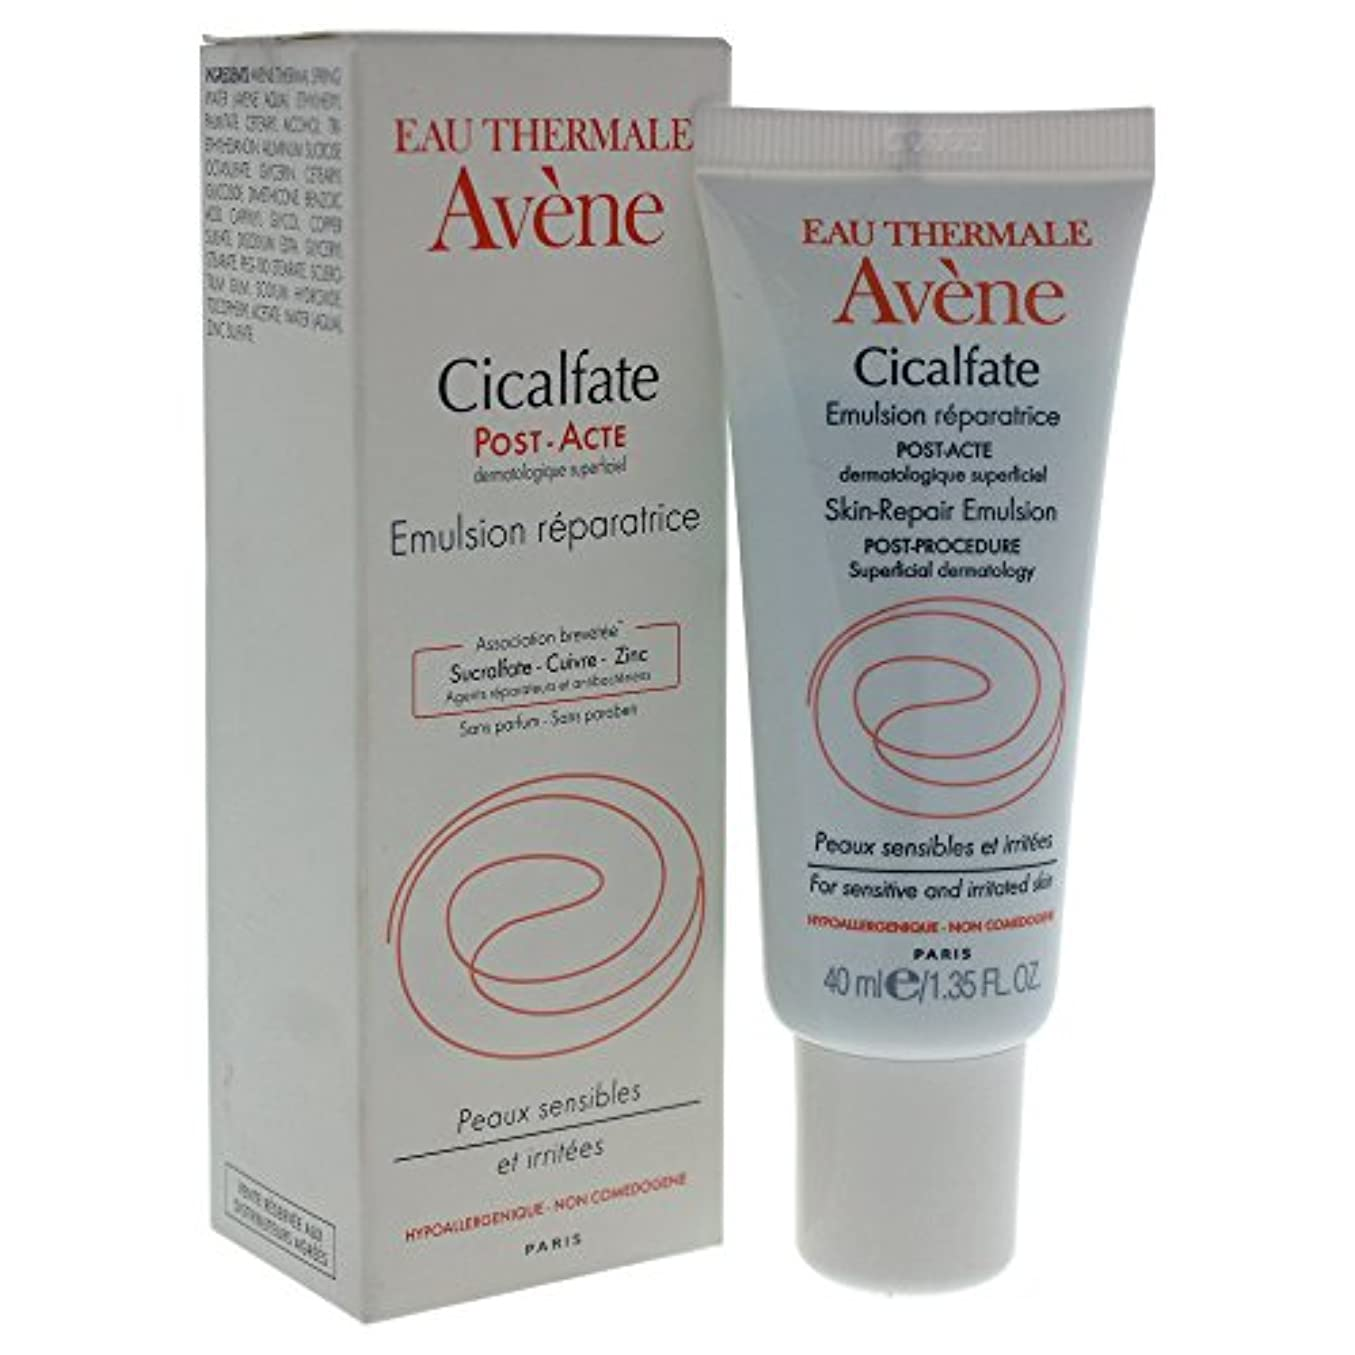 歯科医中傷女王Avene Cicalfate Skin Repair Emulsion Post-procedure 40ml [並行輸入品]